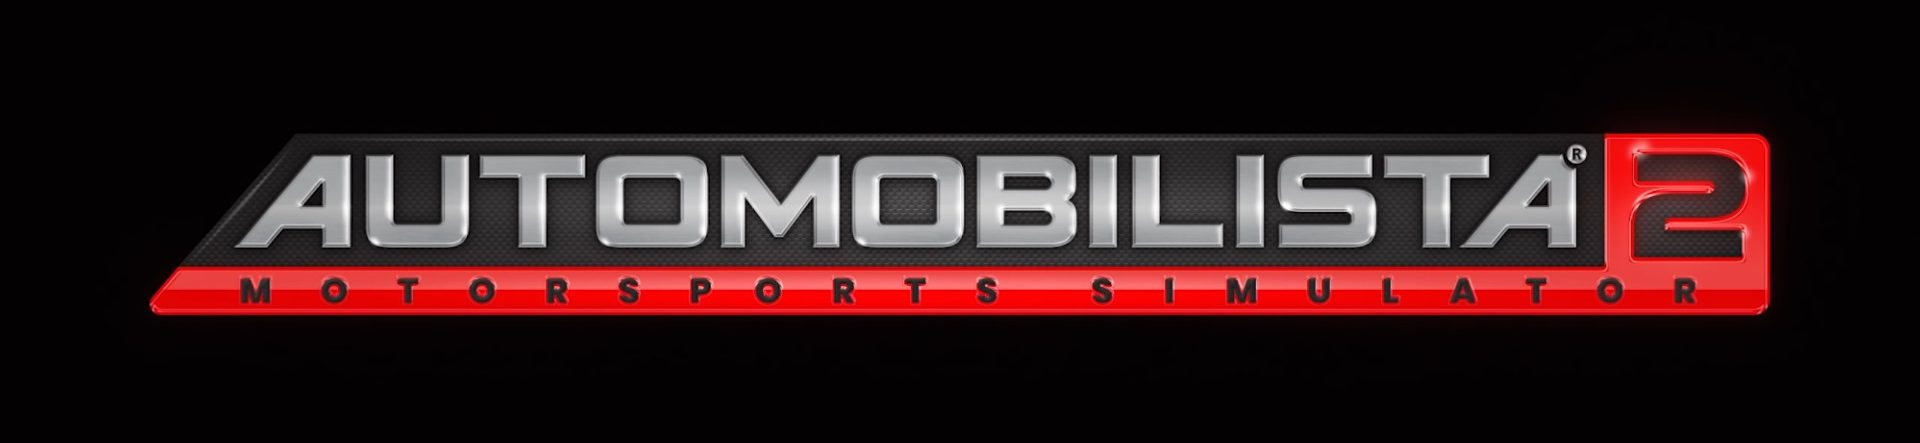 Reiza Studios reveals Automobilista 2 ahead of December ...